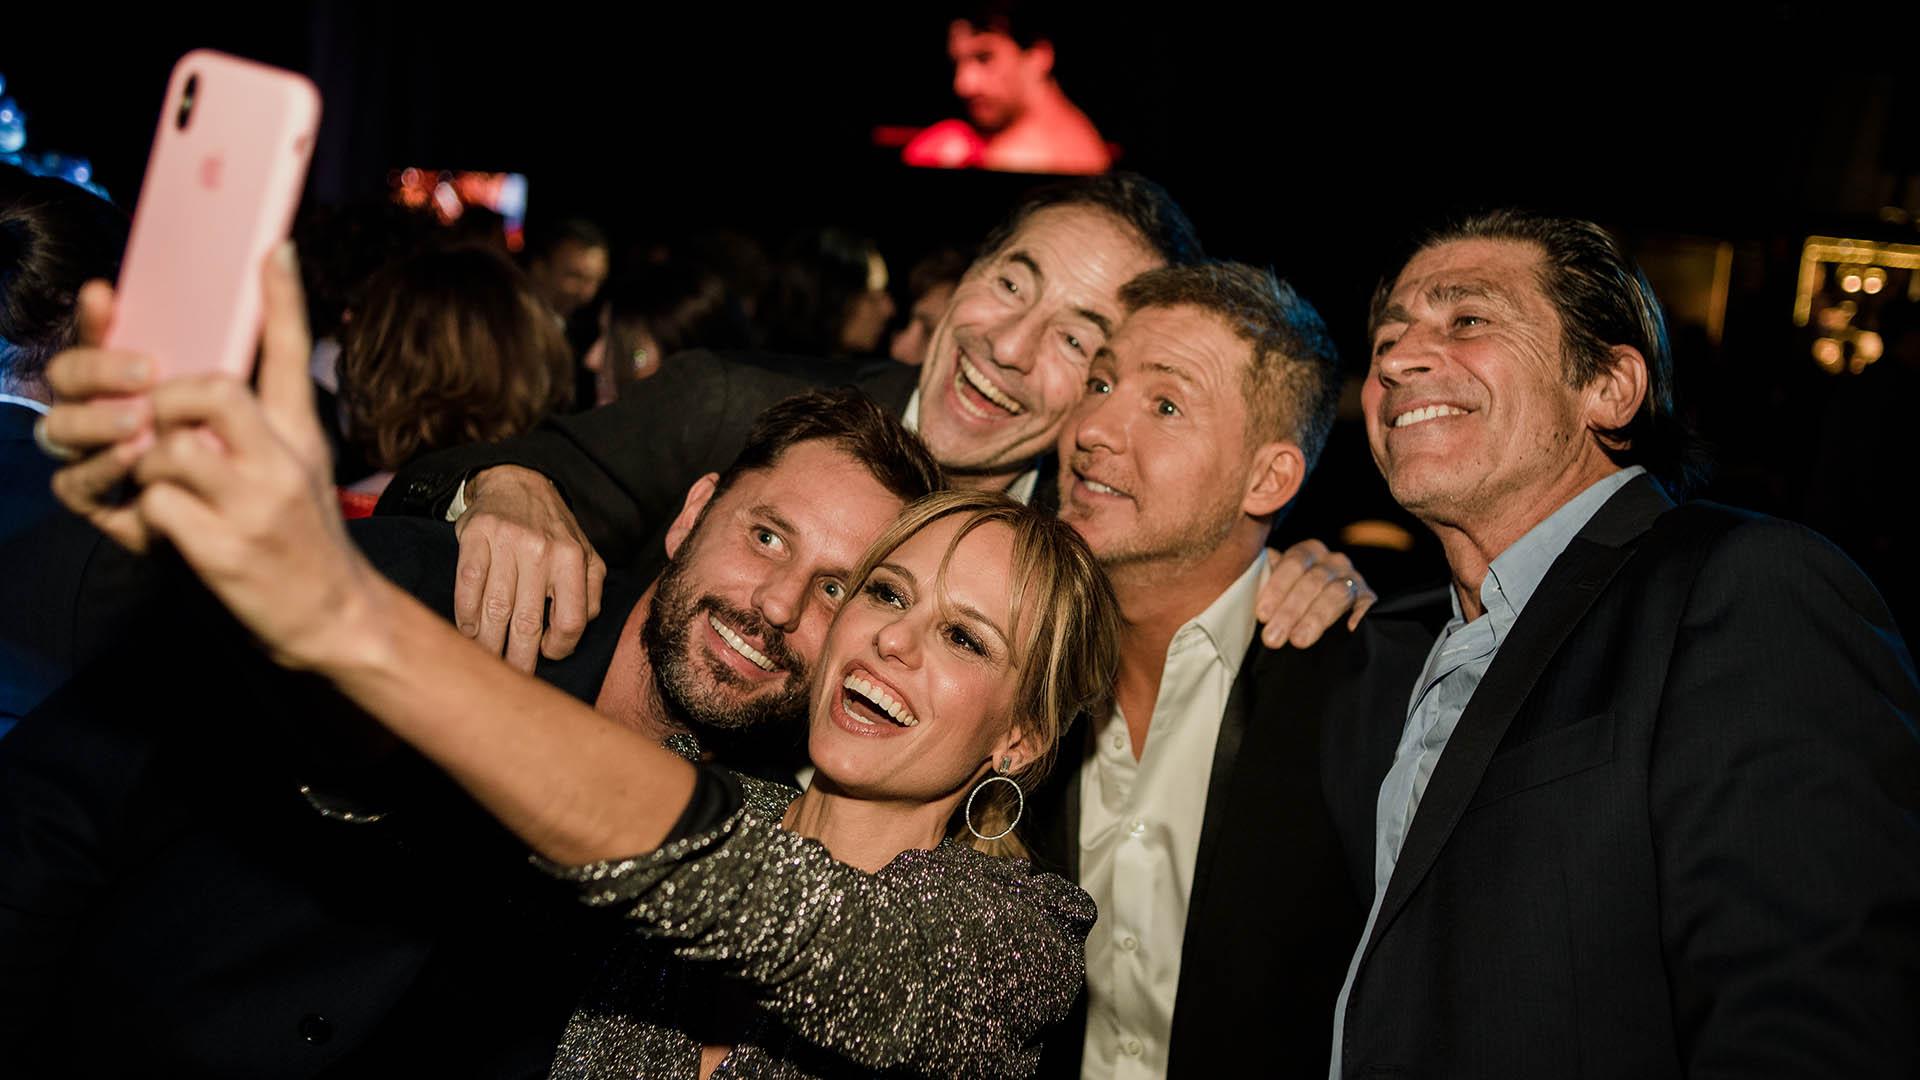 Mariana Fabianni saca una selfie con sus colegas